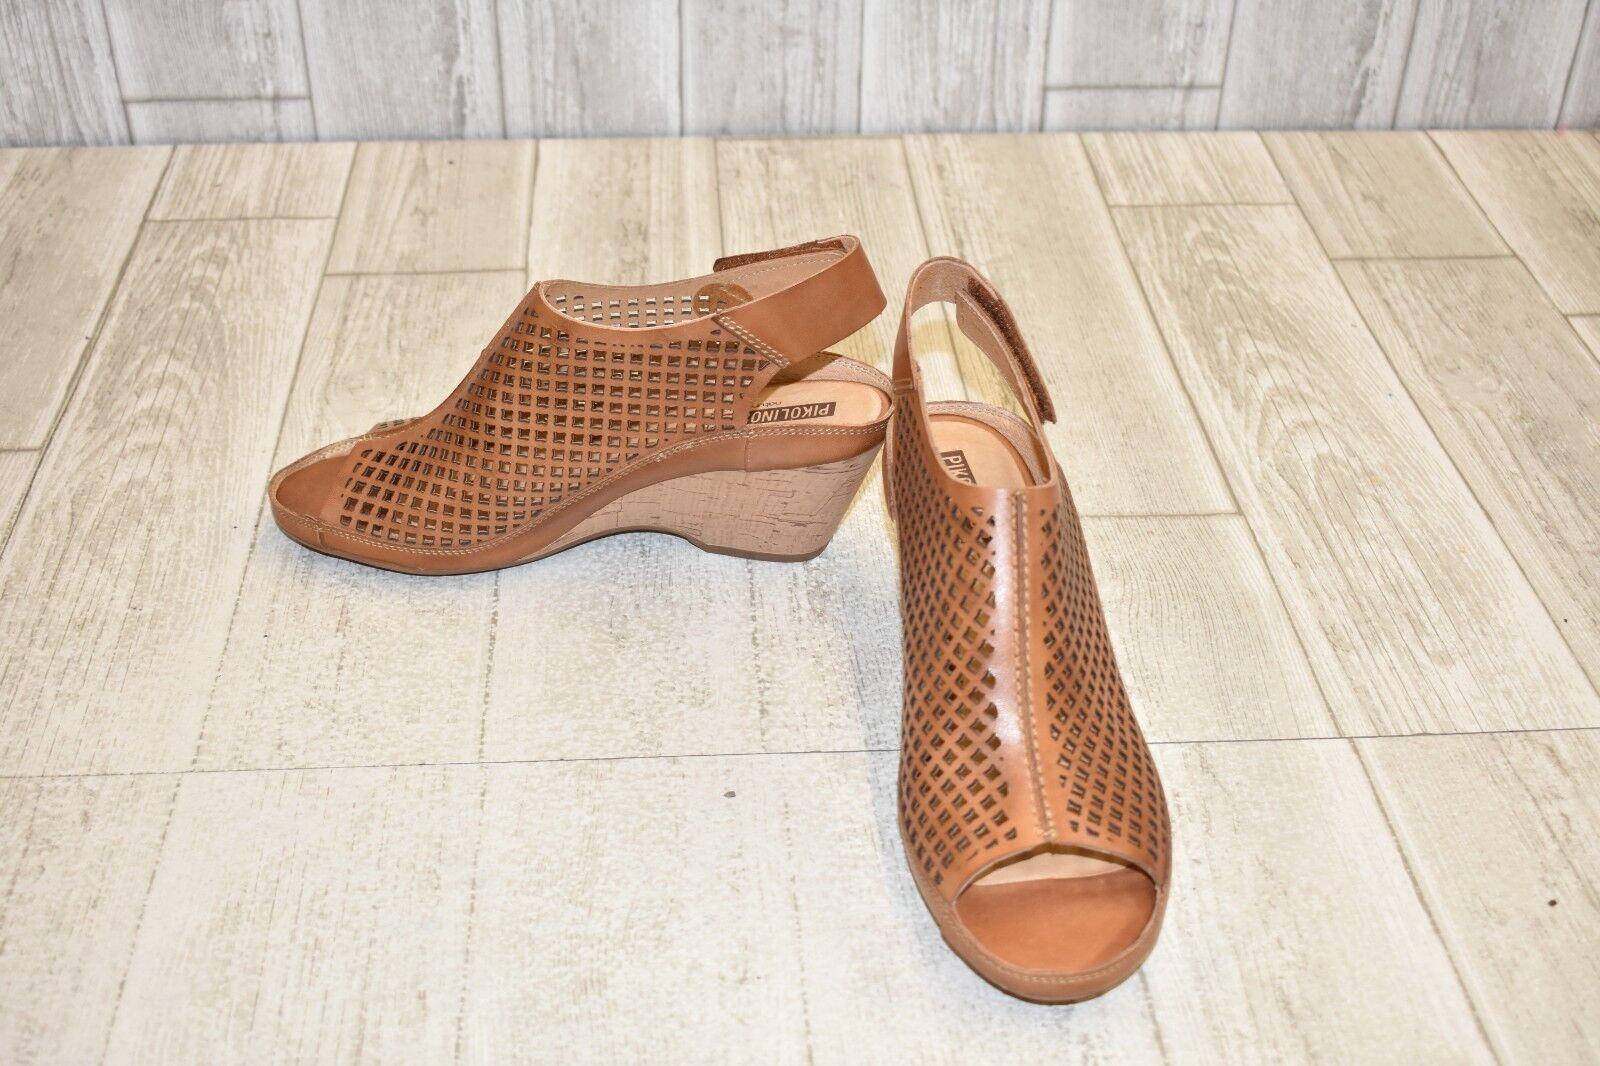 Pikolinos Capri Brandy Sandal Heel - Women's Size 9.5 10 Brown